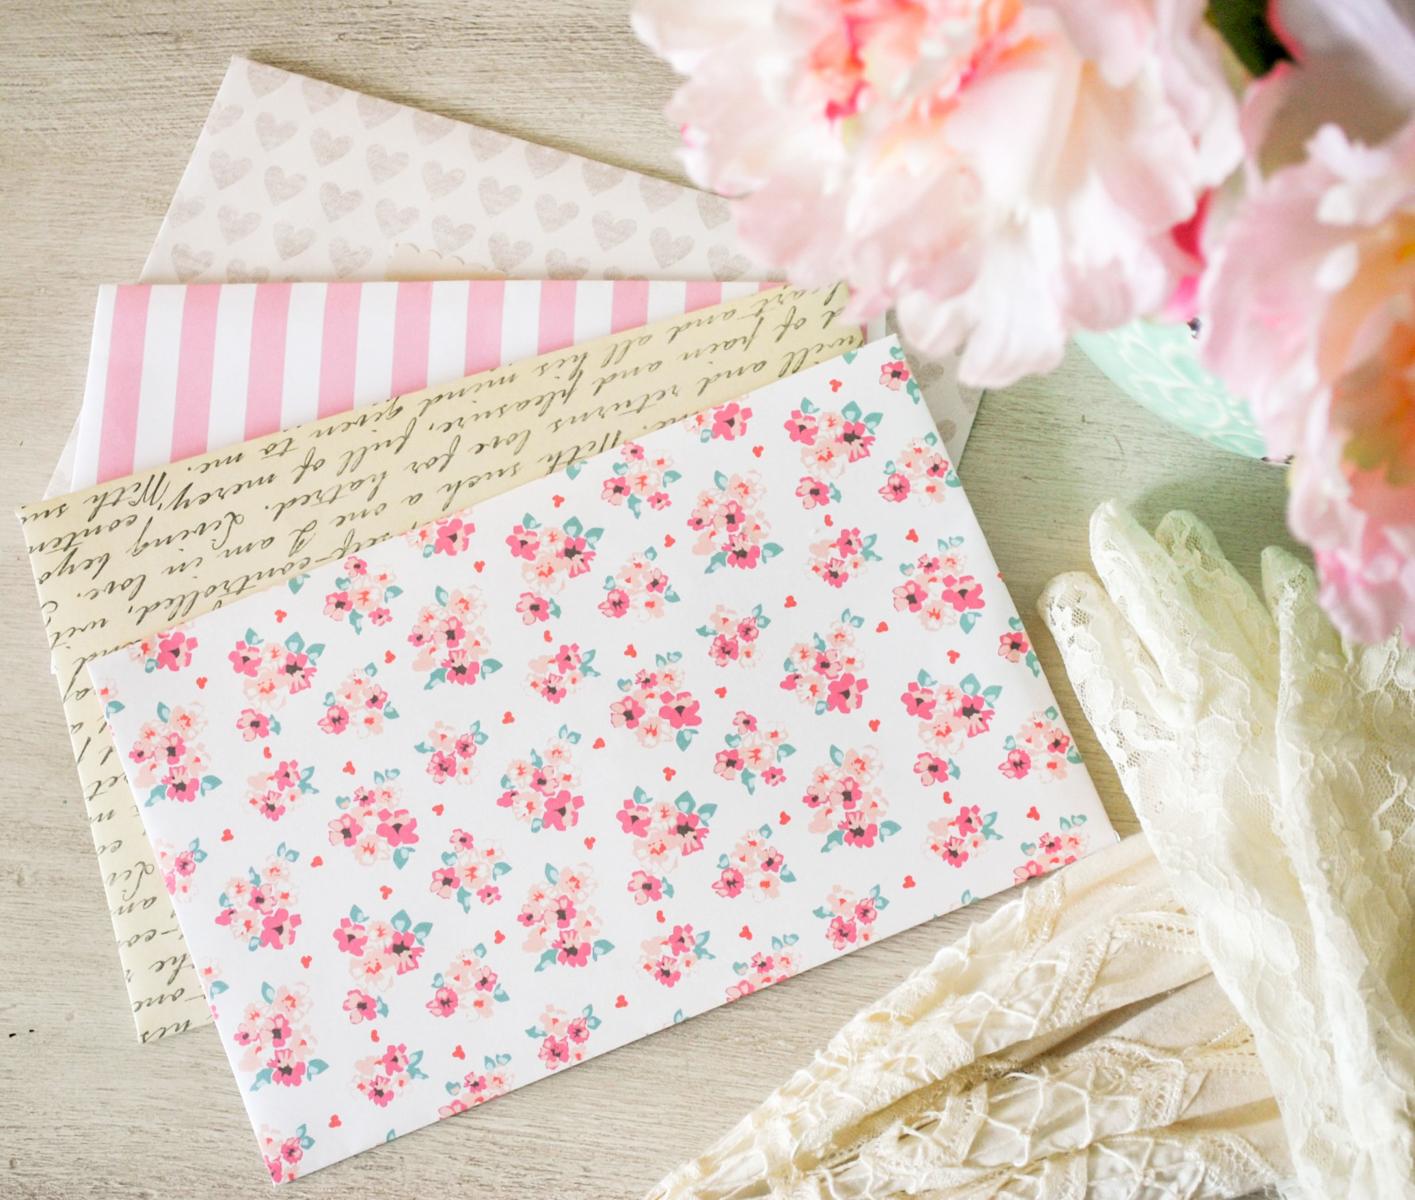 How to make an Envelope – DIY heart Envelope